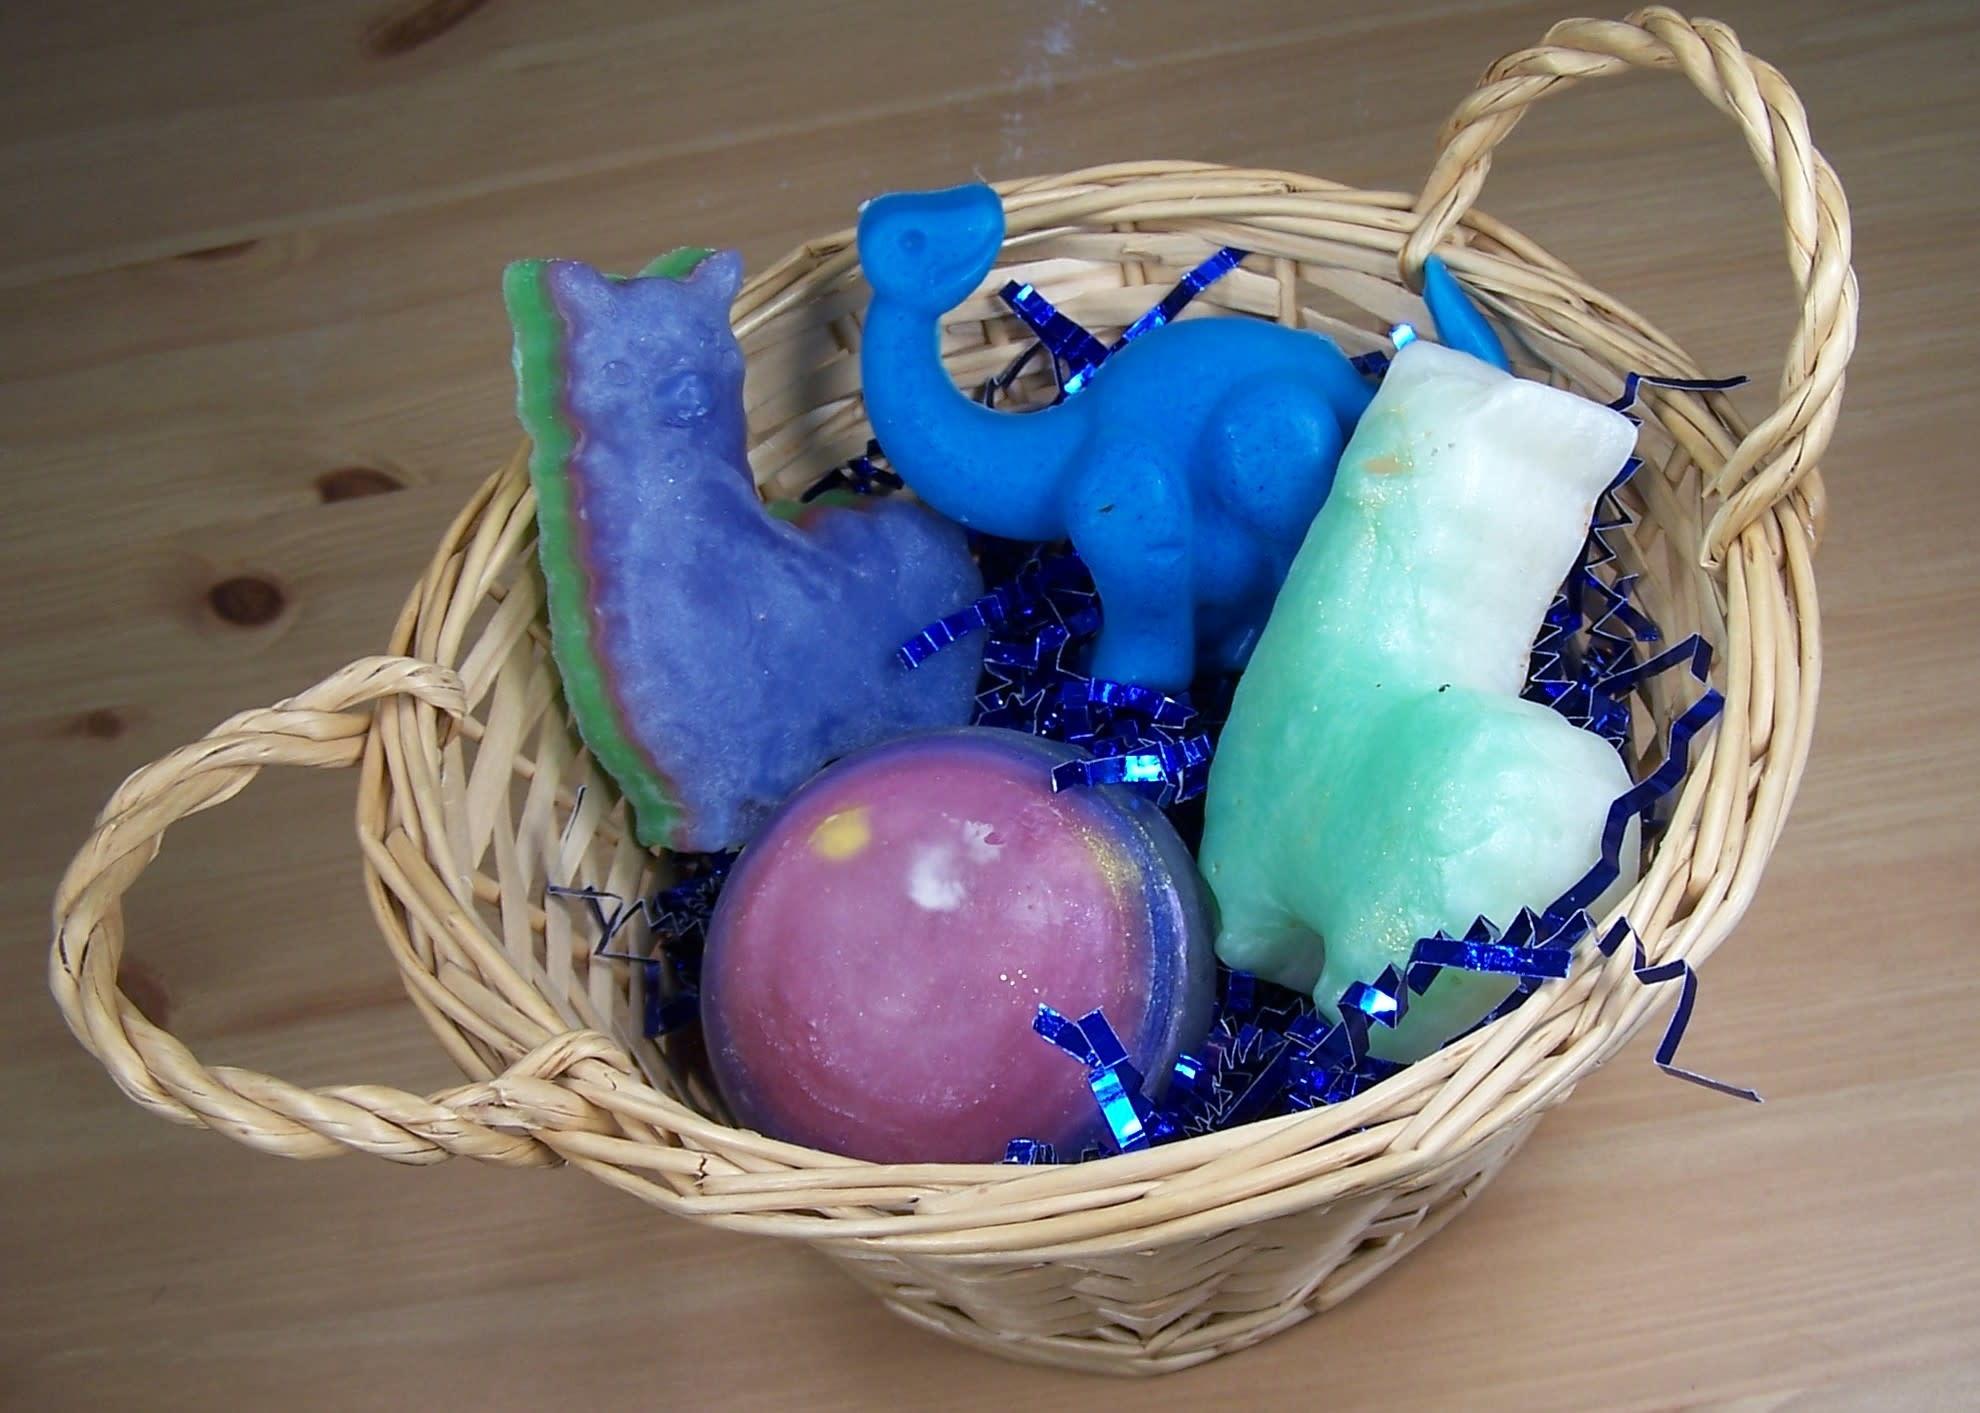 Novelty Soap Basket: 5 soap bars